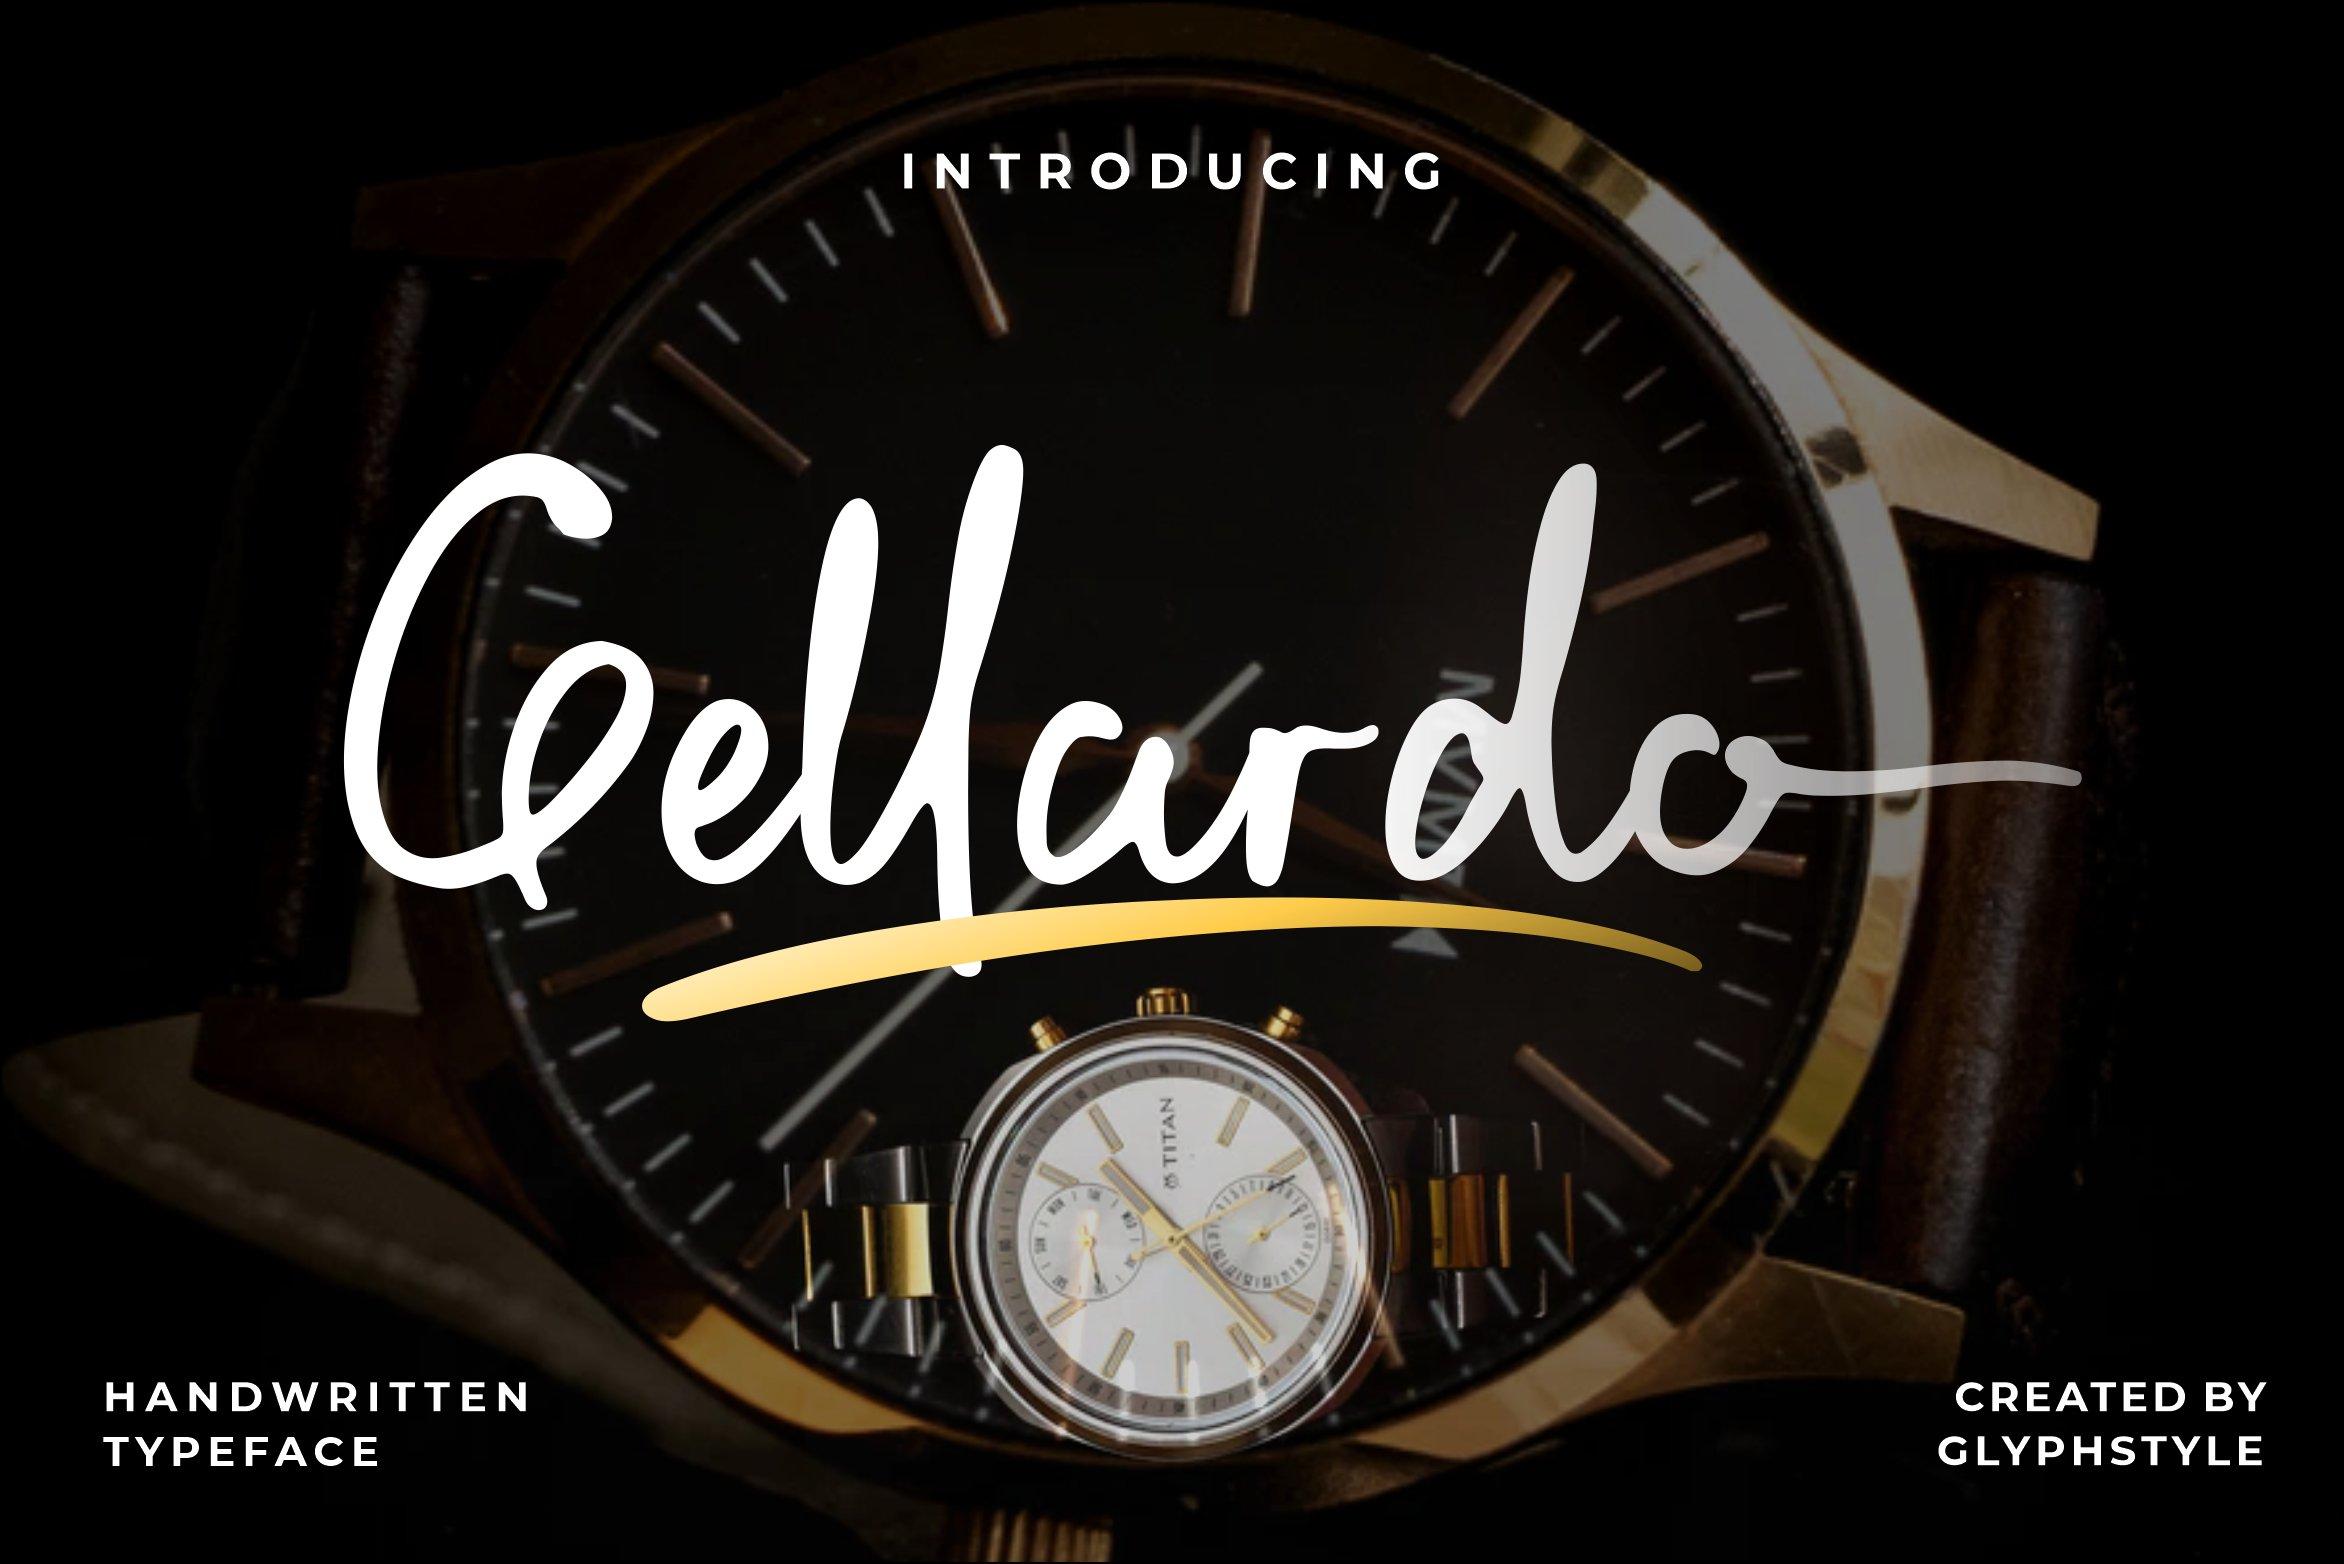 Gellardo Handwritten Typeface example image 1